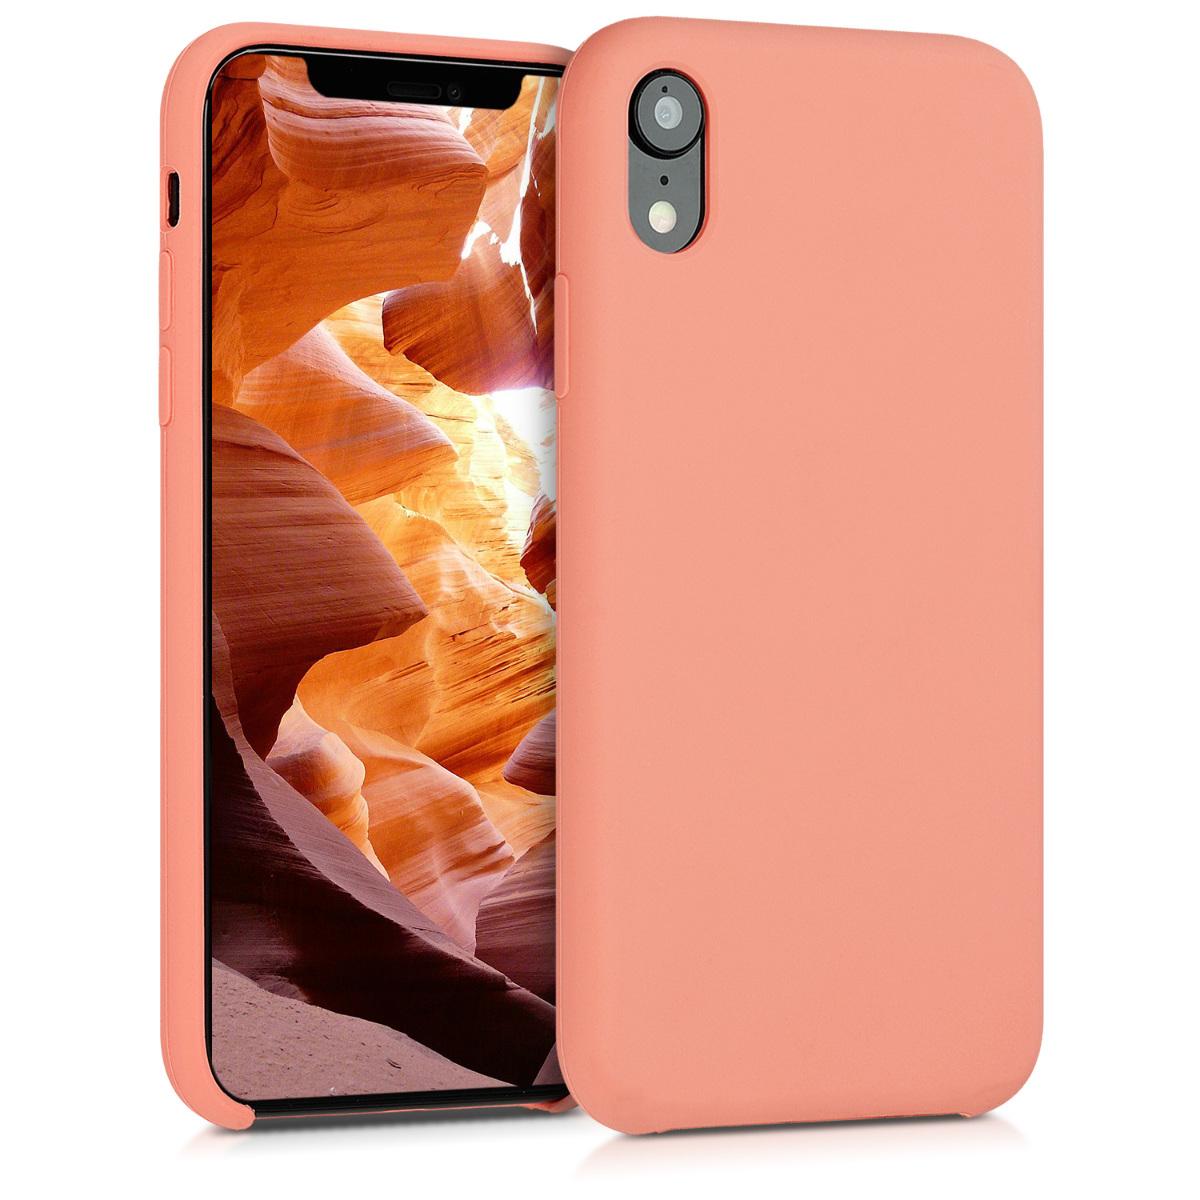 KW Θήκη Σιλικόνης iPhone XR - Coral (45910.76)